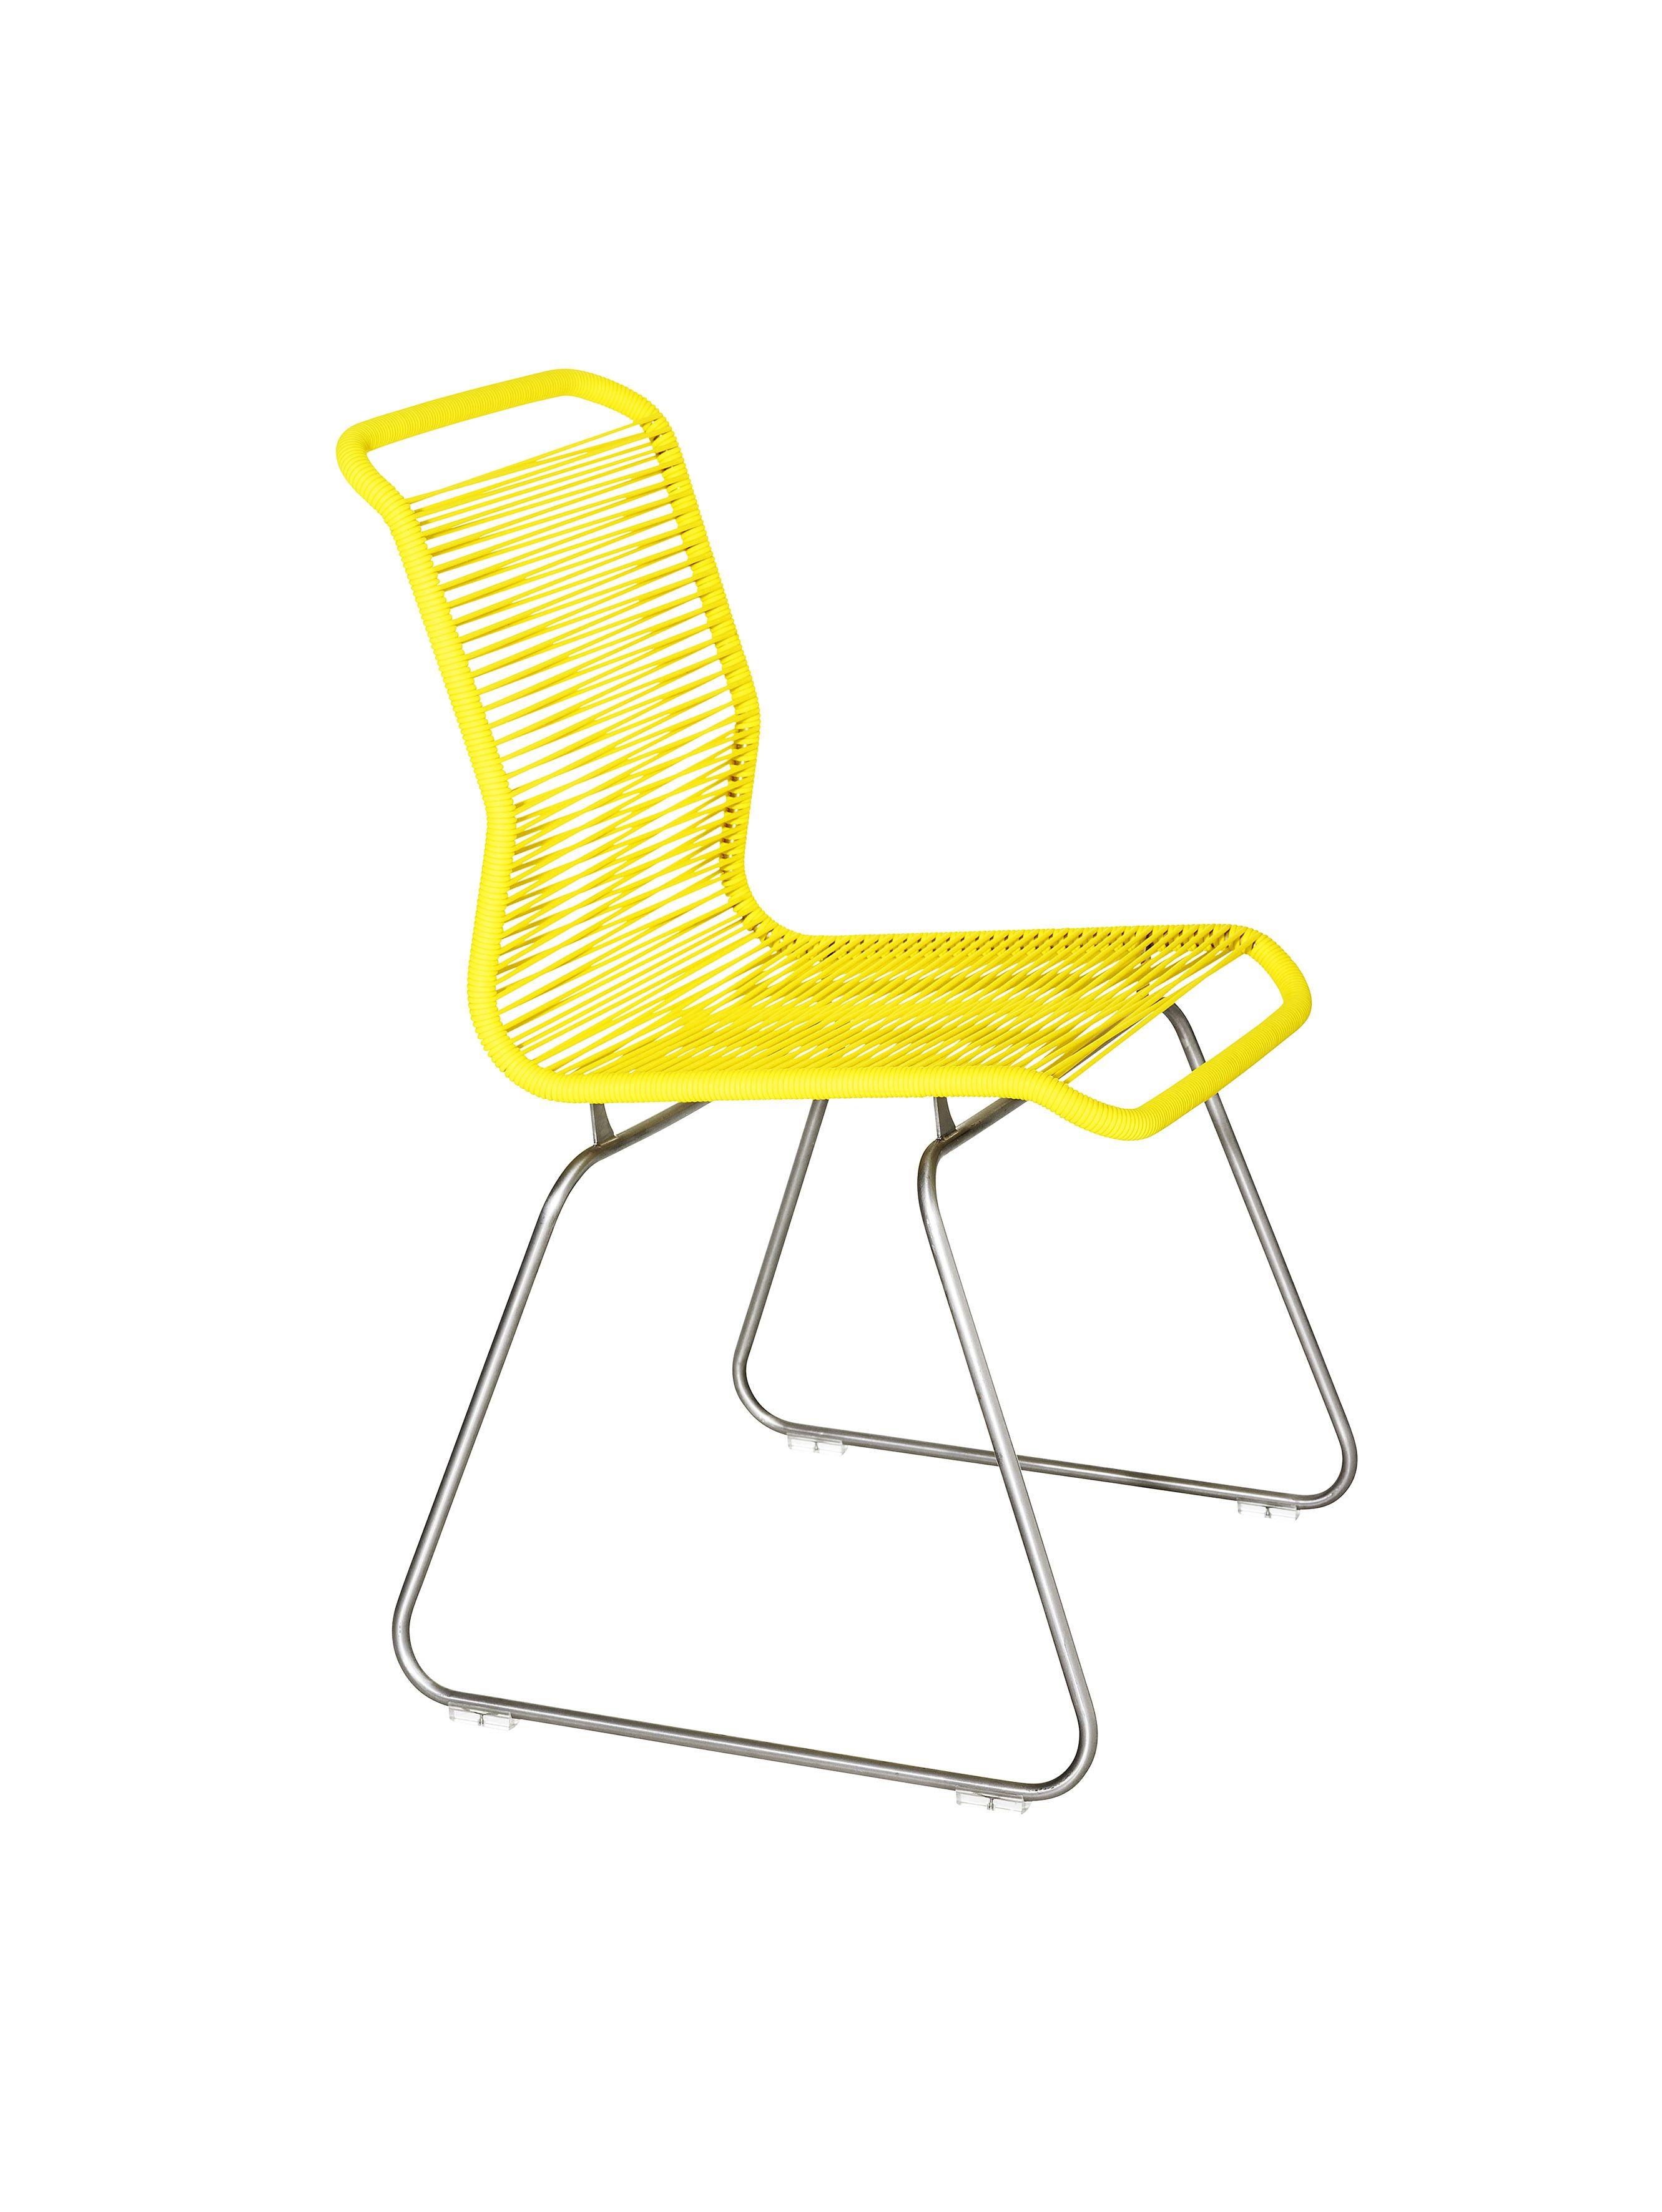 The Panton One Chair In Tokyo Yellow. #montana #furniture #panton #pantonone